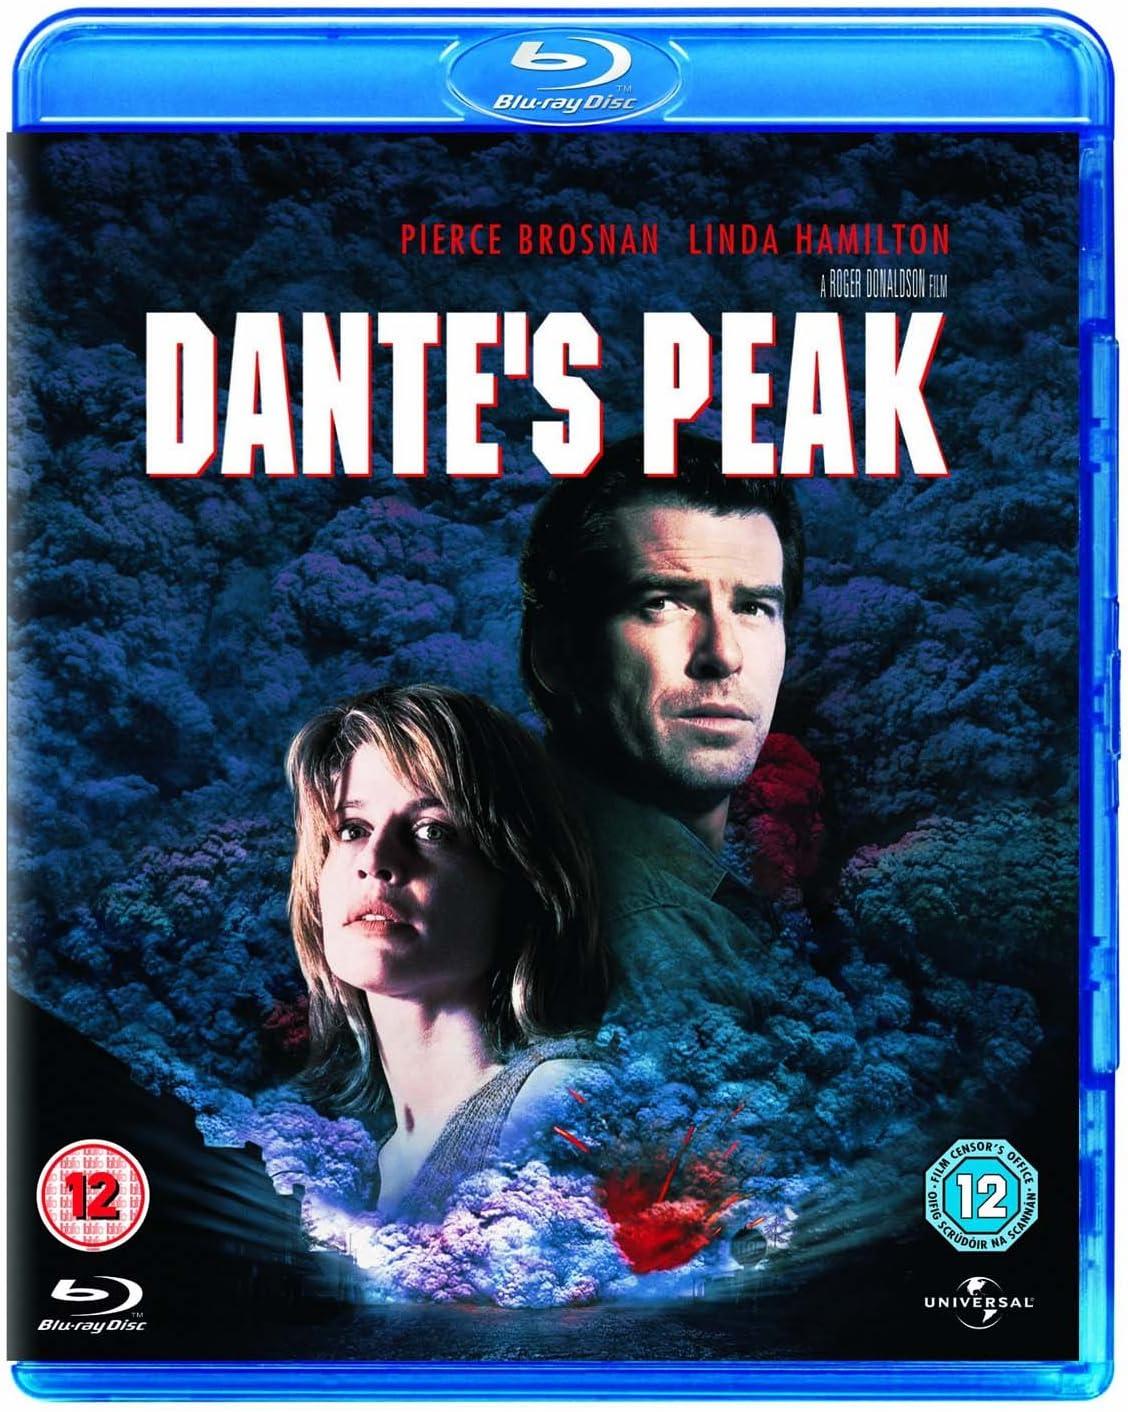 Dante S Peak Blu Ray 1997 Region Free Amazon Co Uk Pierce Brosnan Linda Hamilton Roger Donaldson Pierce Brosnan Linda Hamilton Dvd Blu Ray